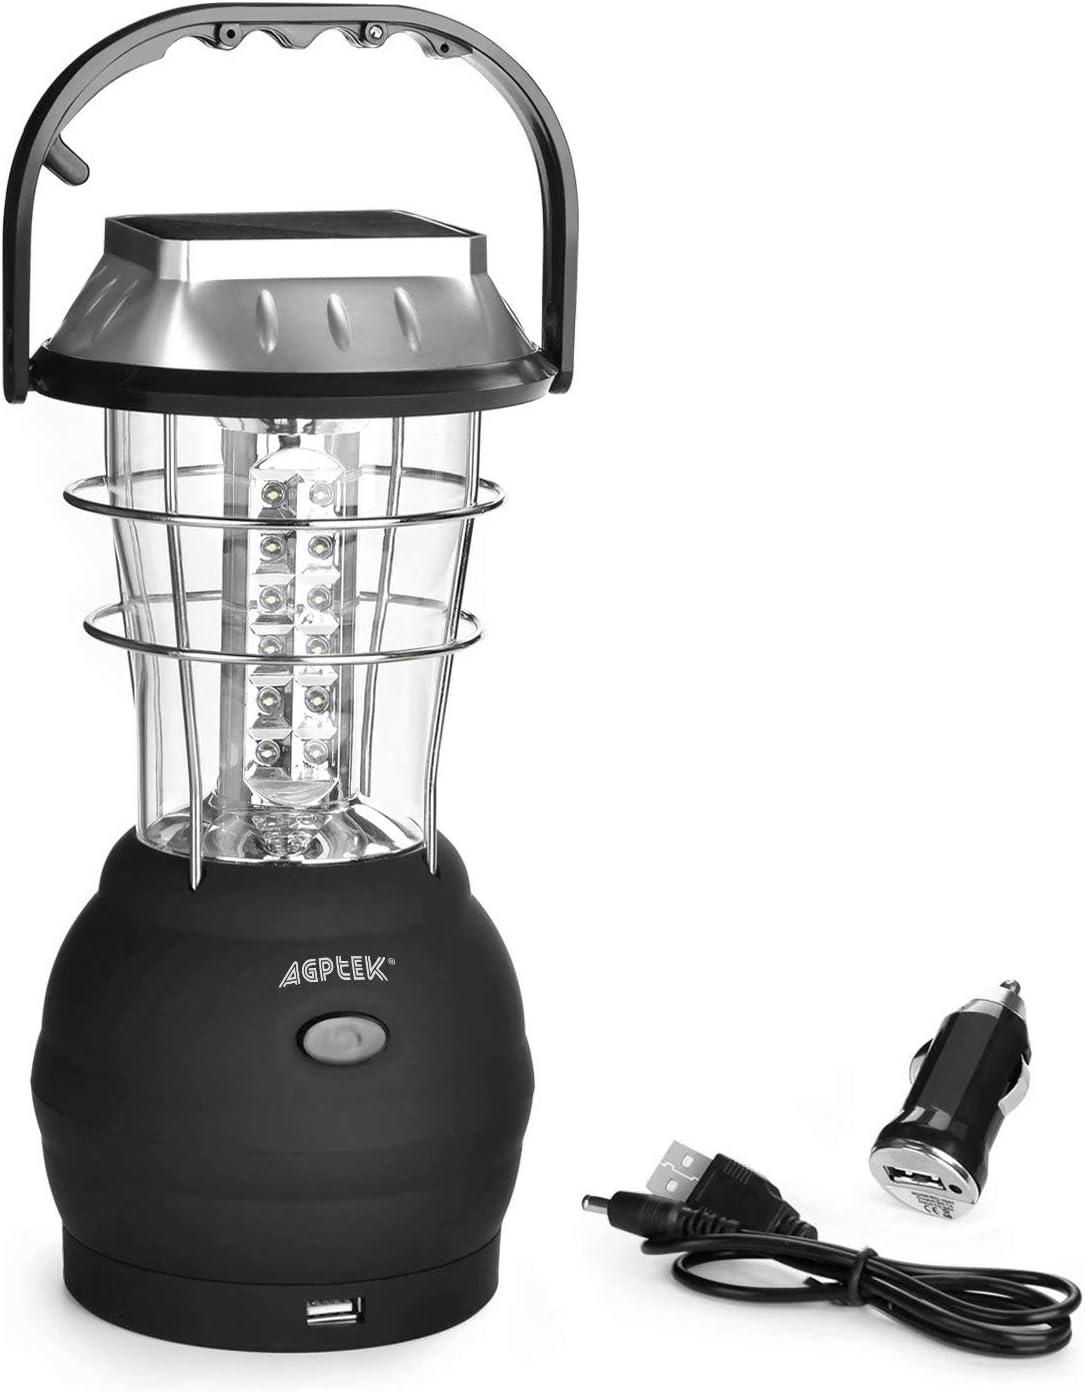 AGPTEK Solar Lantern, 5 Mode Hand Crank Dynamo 36 LED Rechargeable Camping Lantern Emergency Light, Ultra Bright LED Lantern - Car Charge - Camping Gear for Hiking Emergencies Hurricane Outages